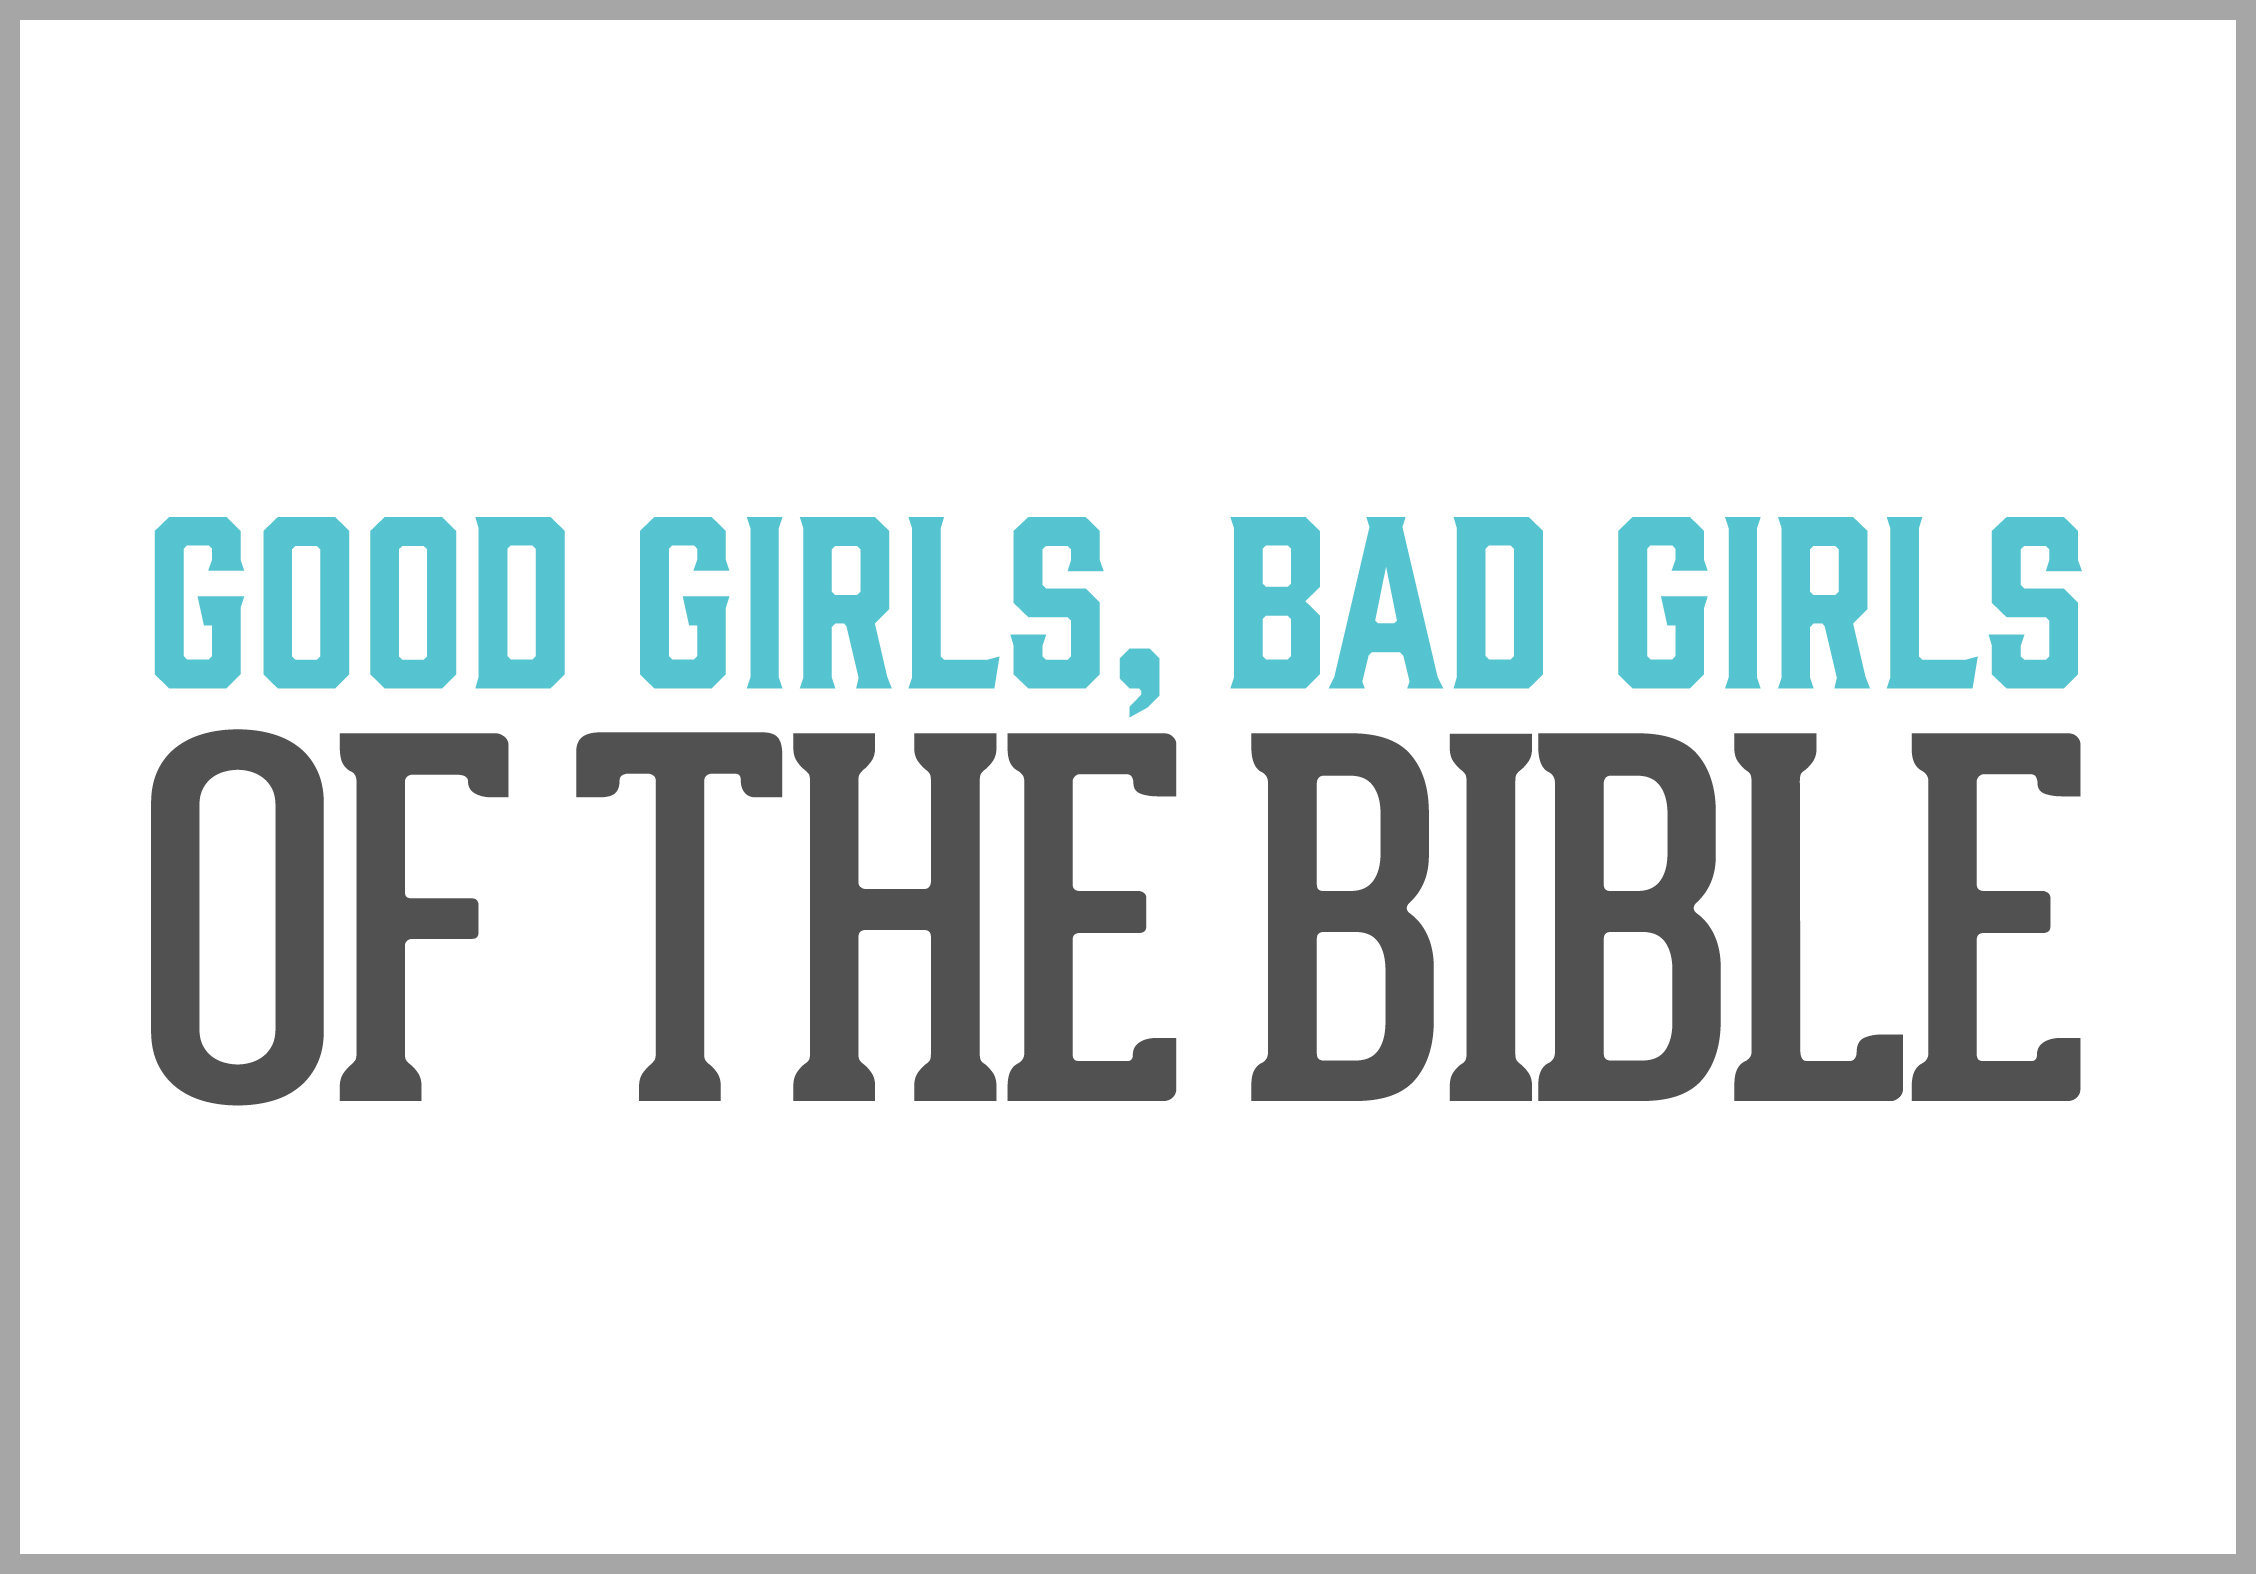 goodgirls.jpg